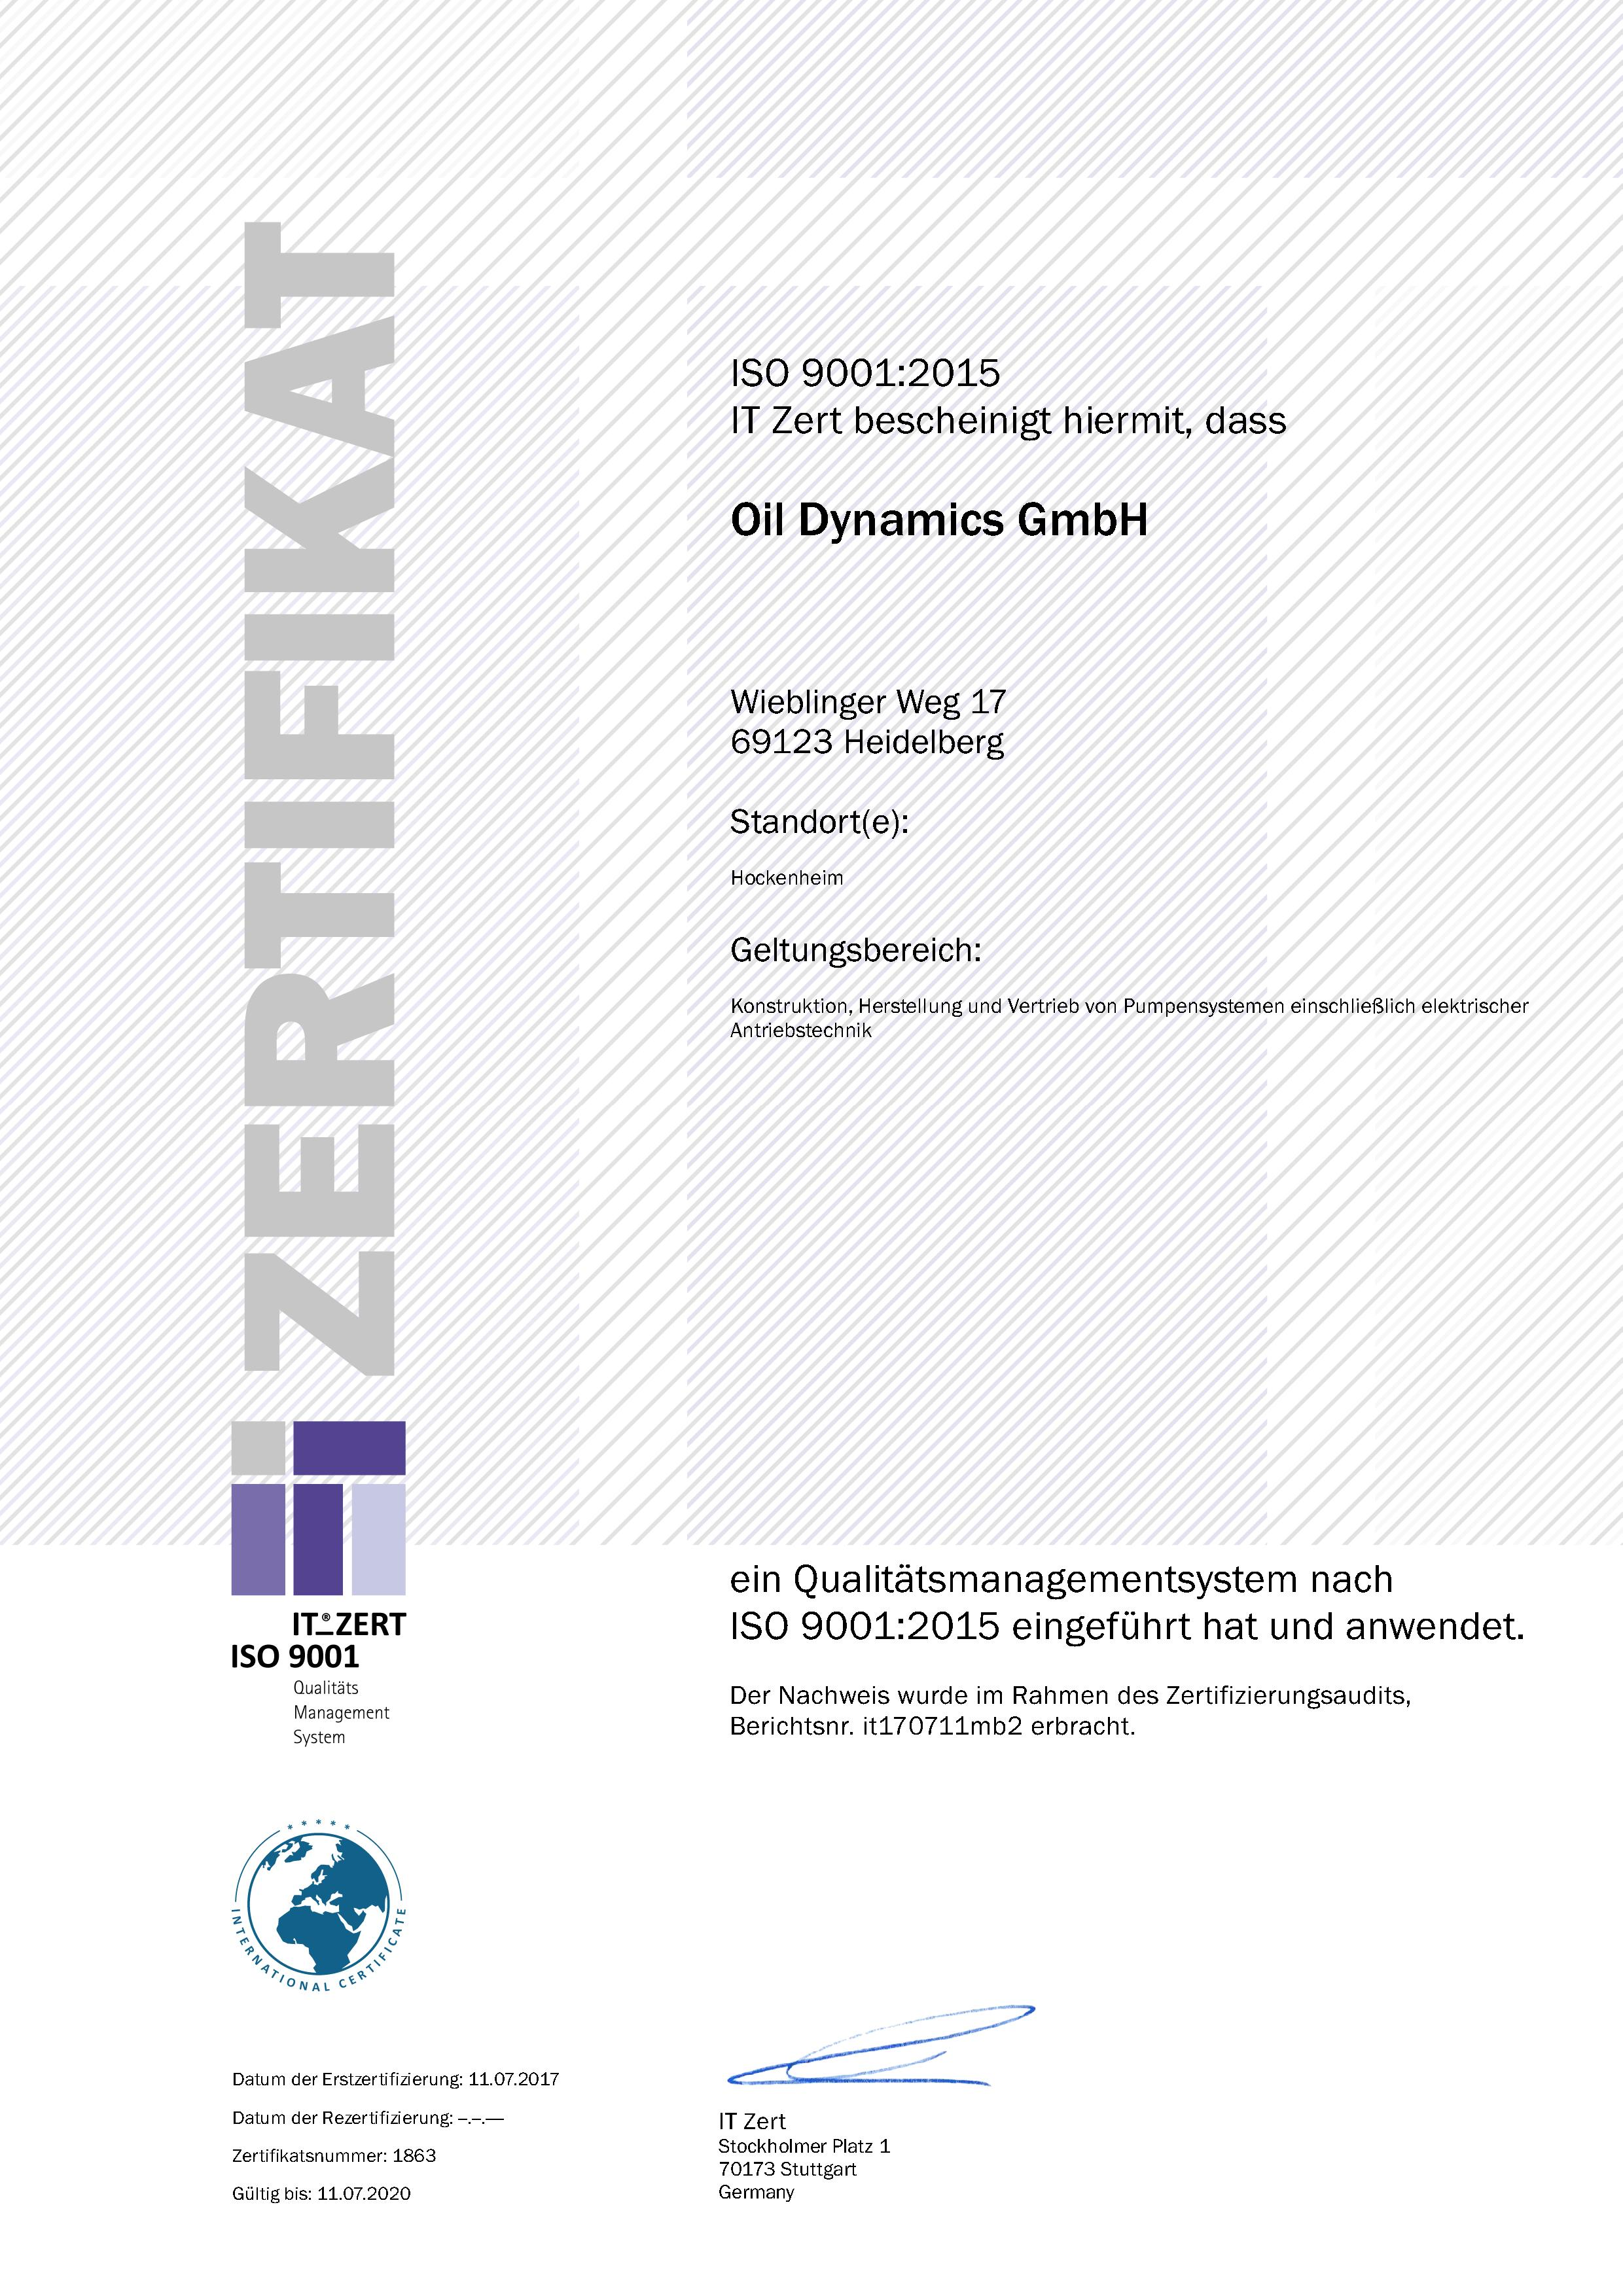 ZERT_ISO9001-2015_Oil Dynamics GmbH_de